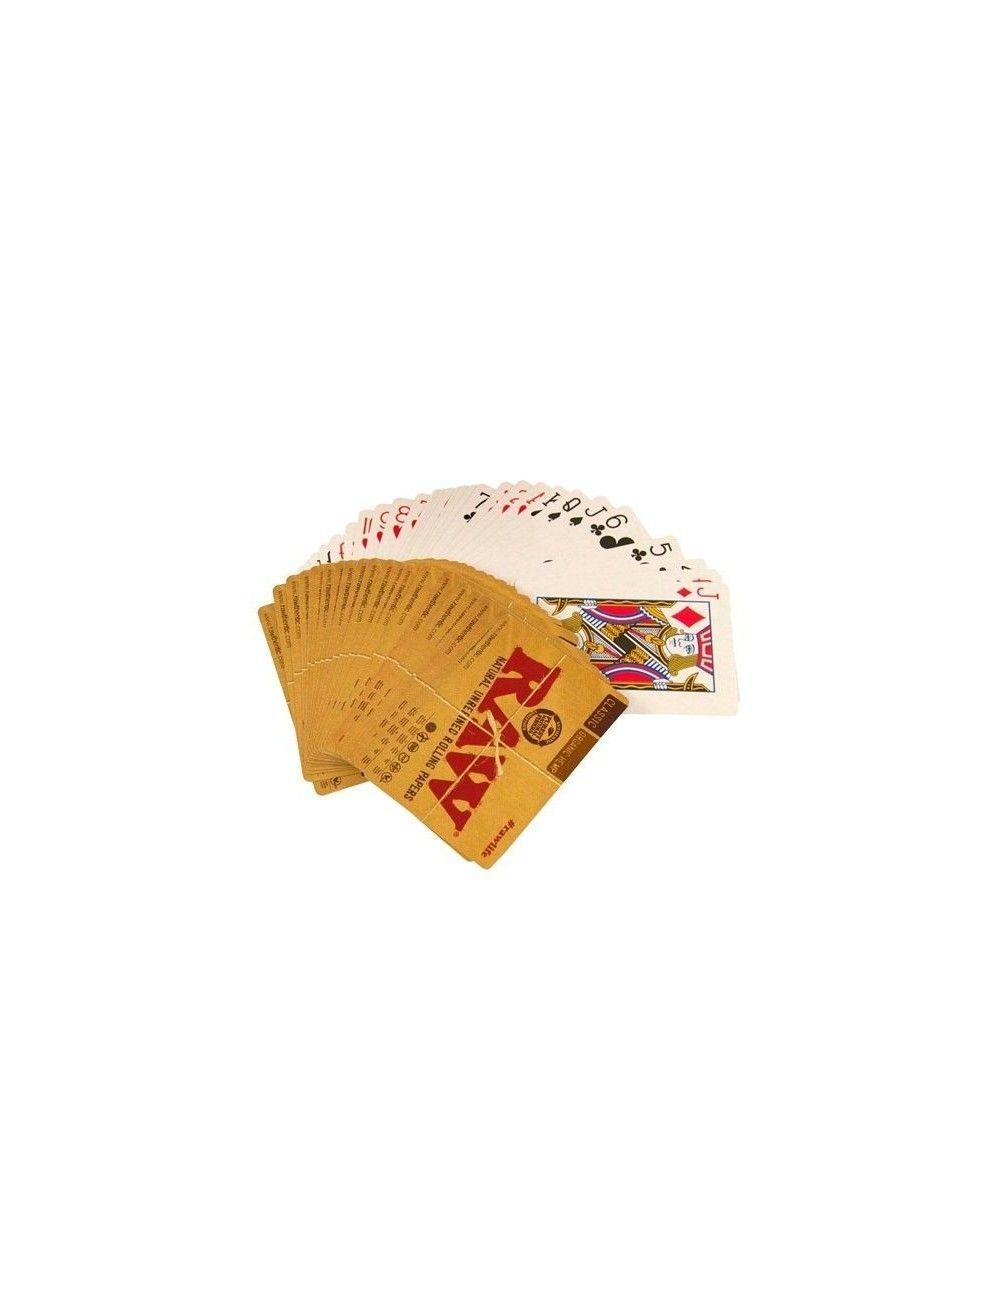 RAW Poker Cards